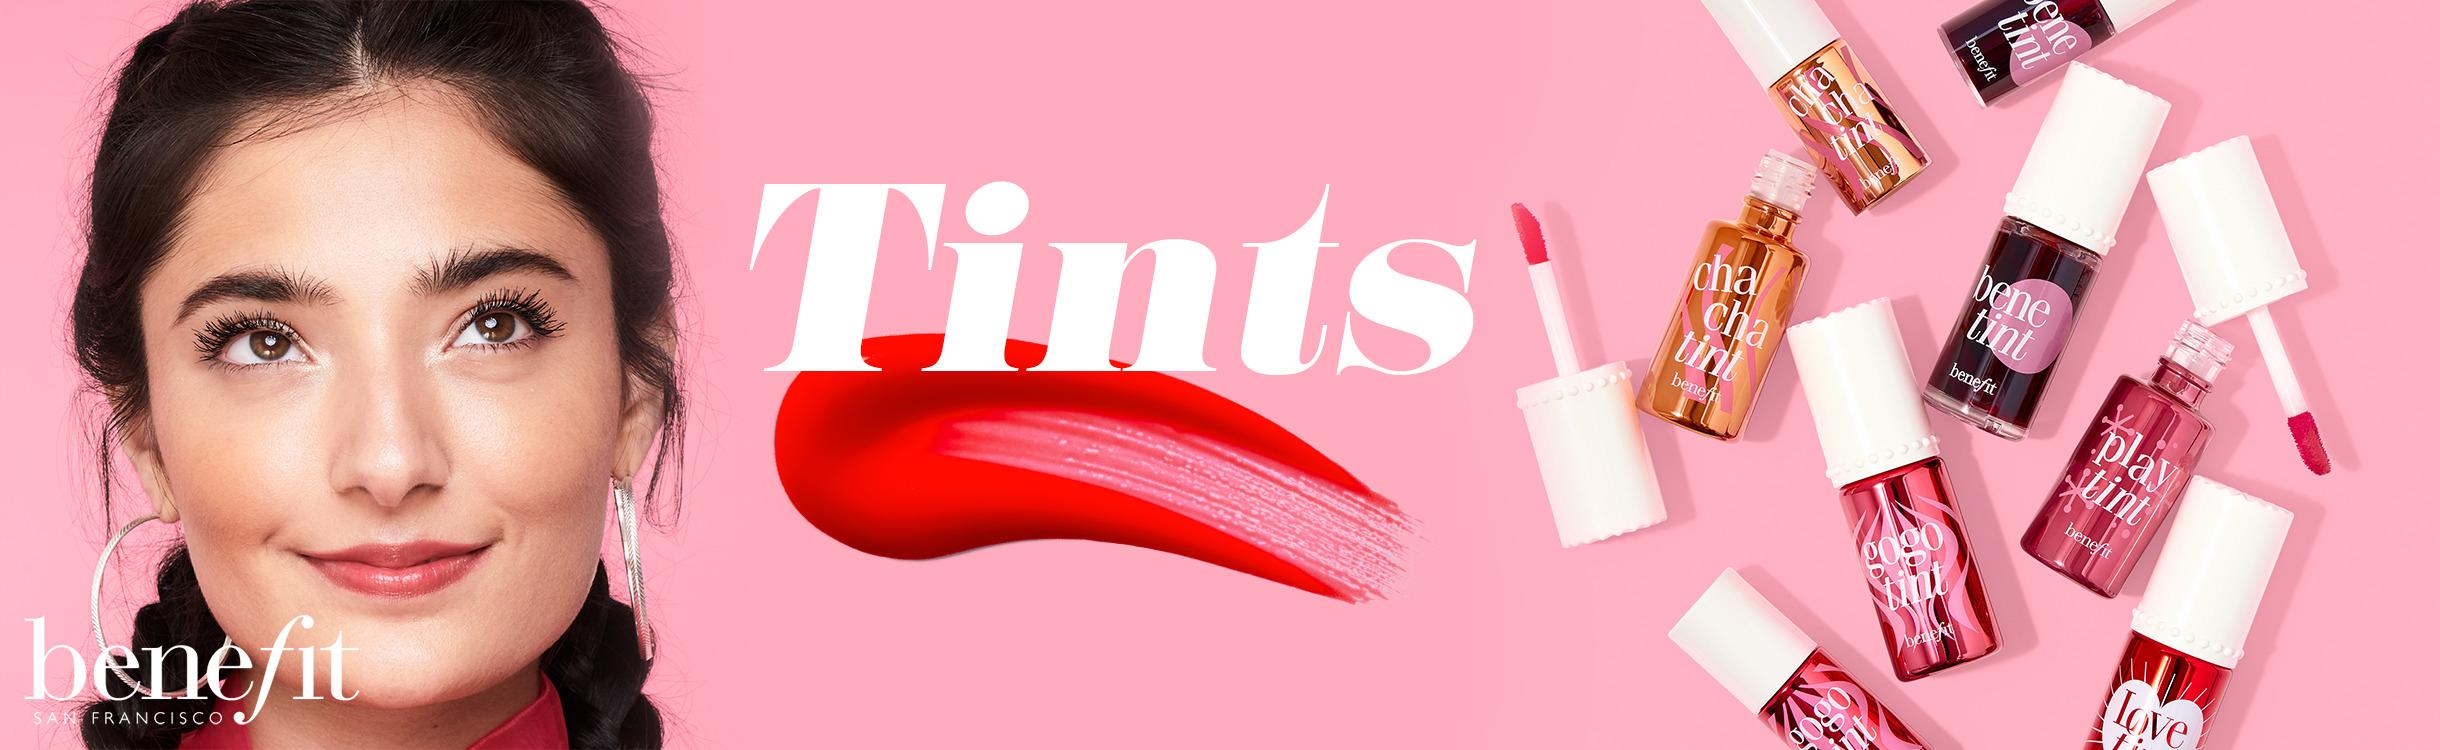 Benefit Cosmetics Tints